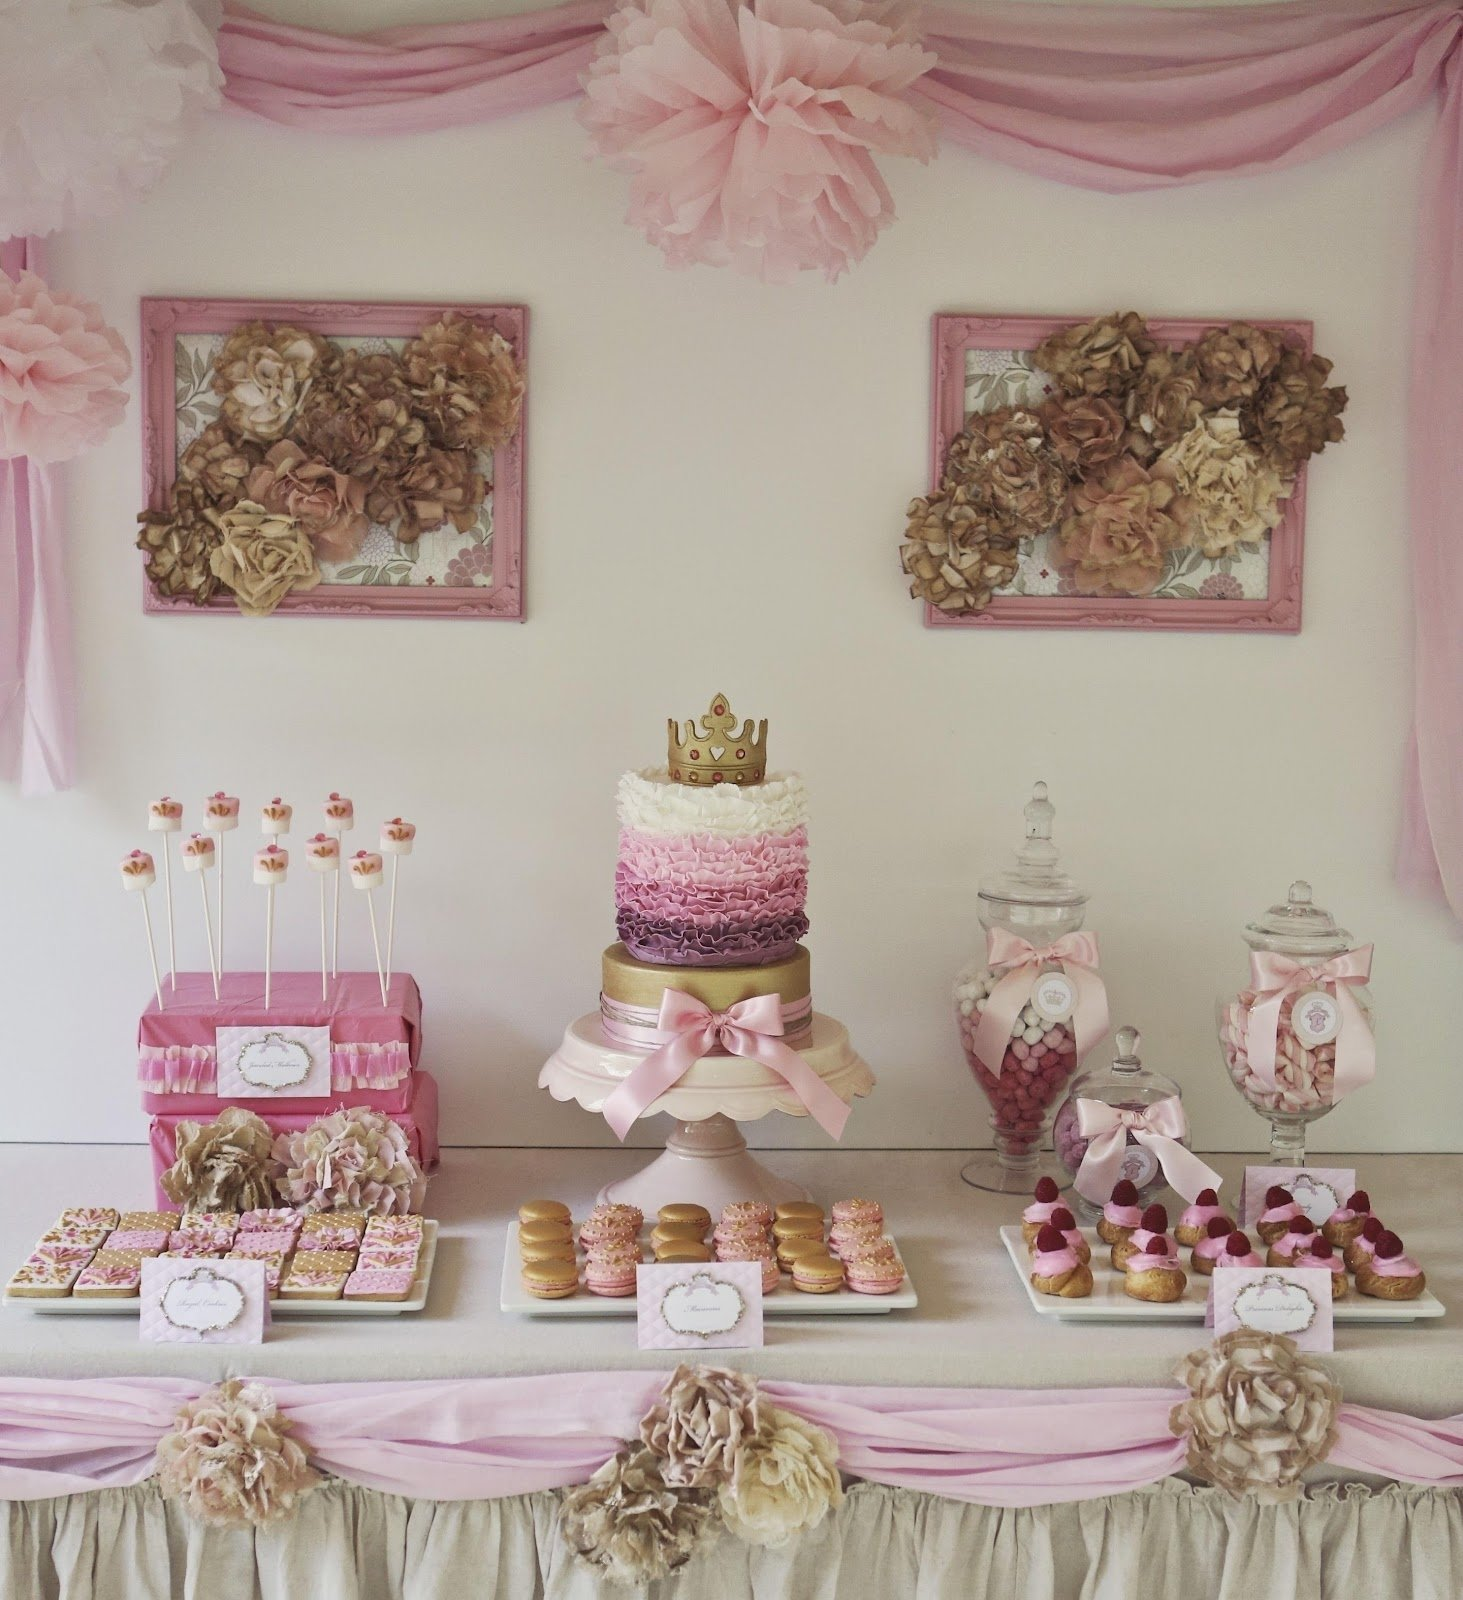 10 Stylish 2 Year Old Birthday Party Ideas Girl 5 year old birthday girl party ideas chic princess 8th 2020